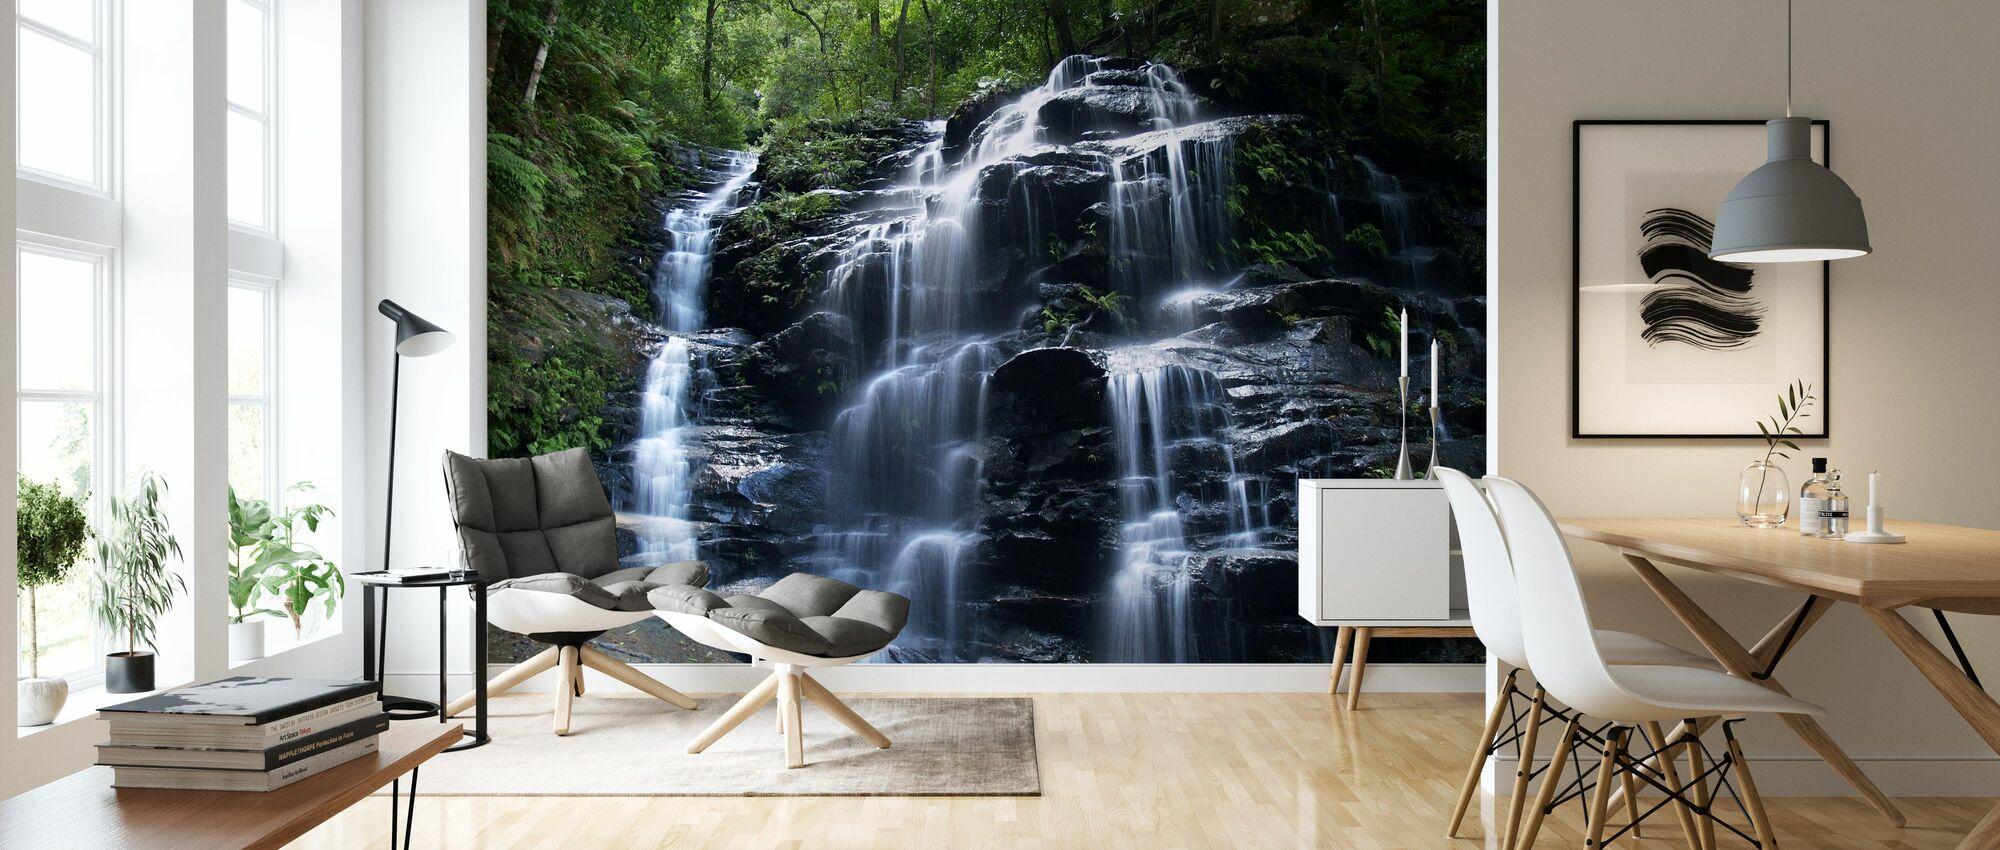 Amazon Waterfall - Wallpaper - Living Room